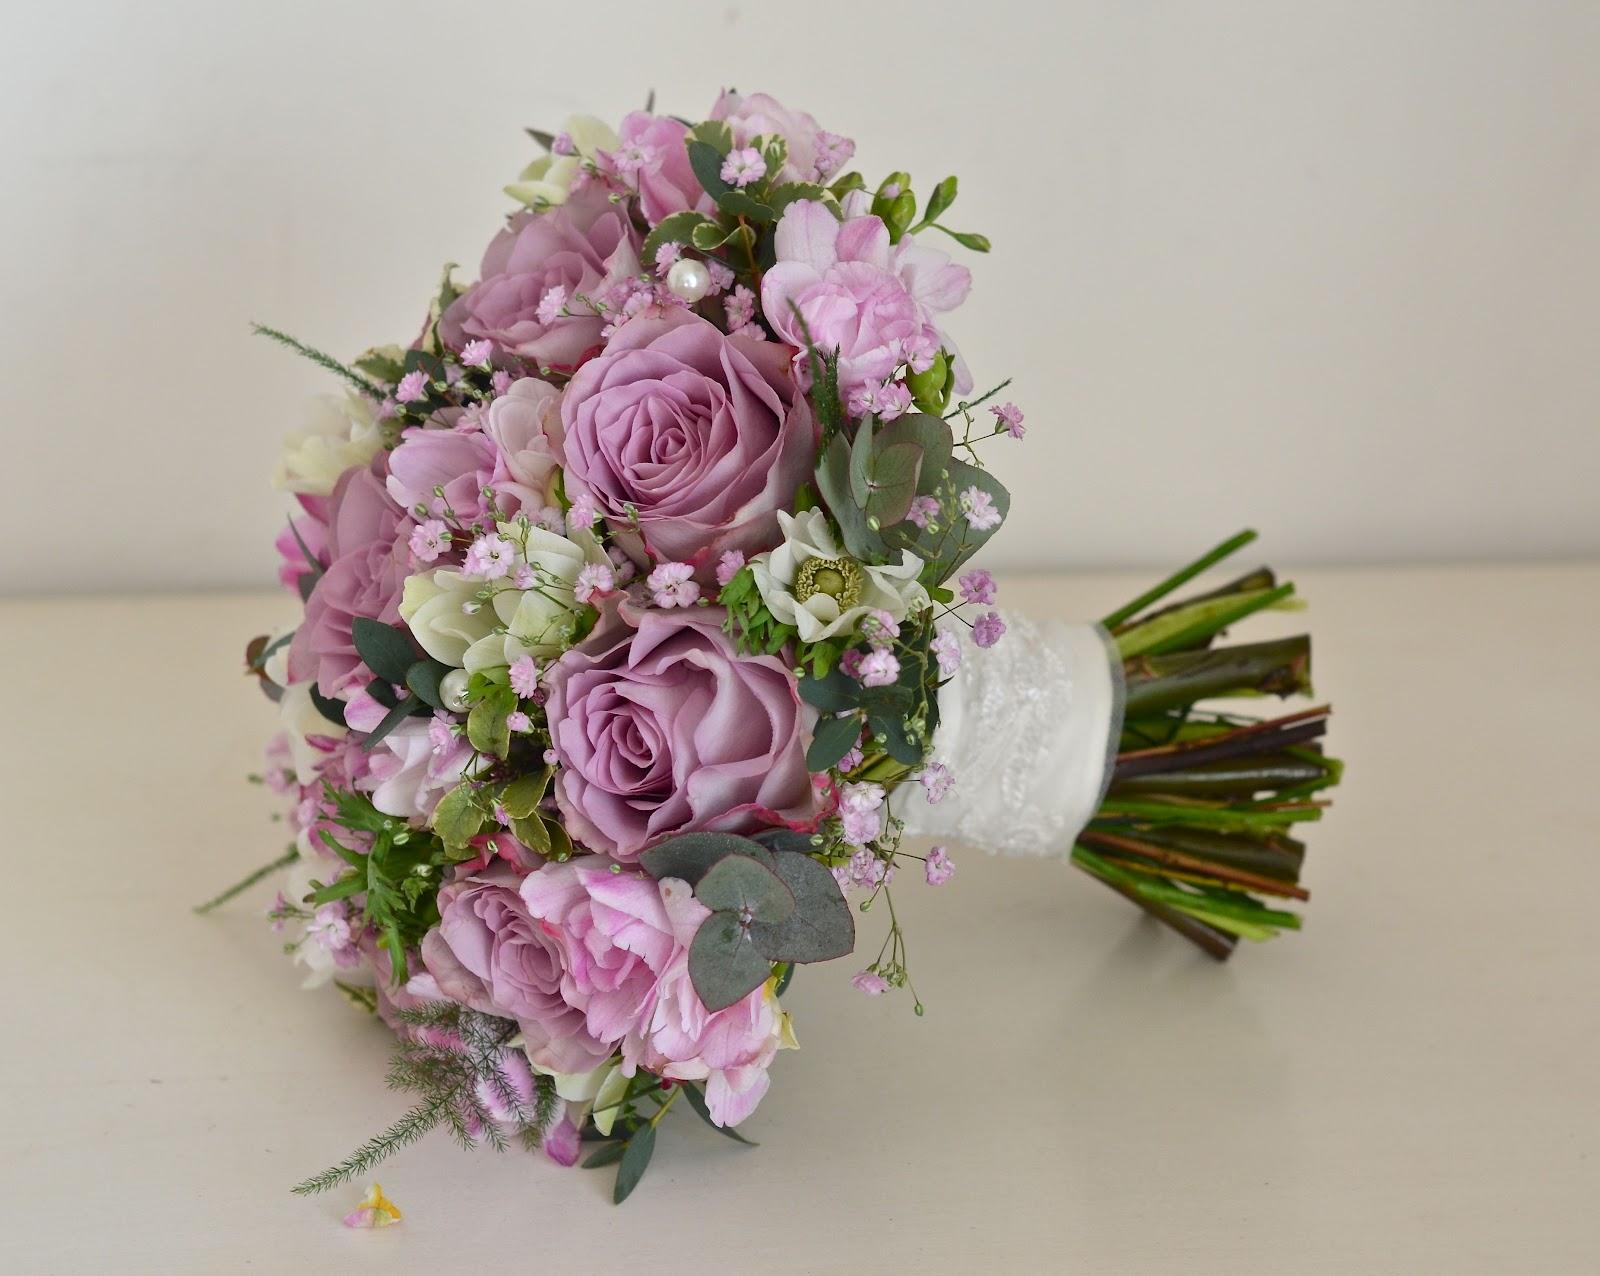 Wedding Flowers Blog: Jemma's Vintage Wedding Flowers